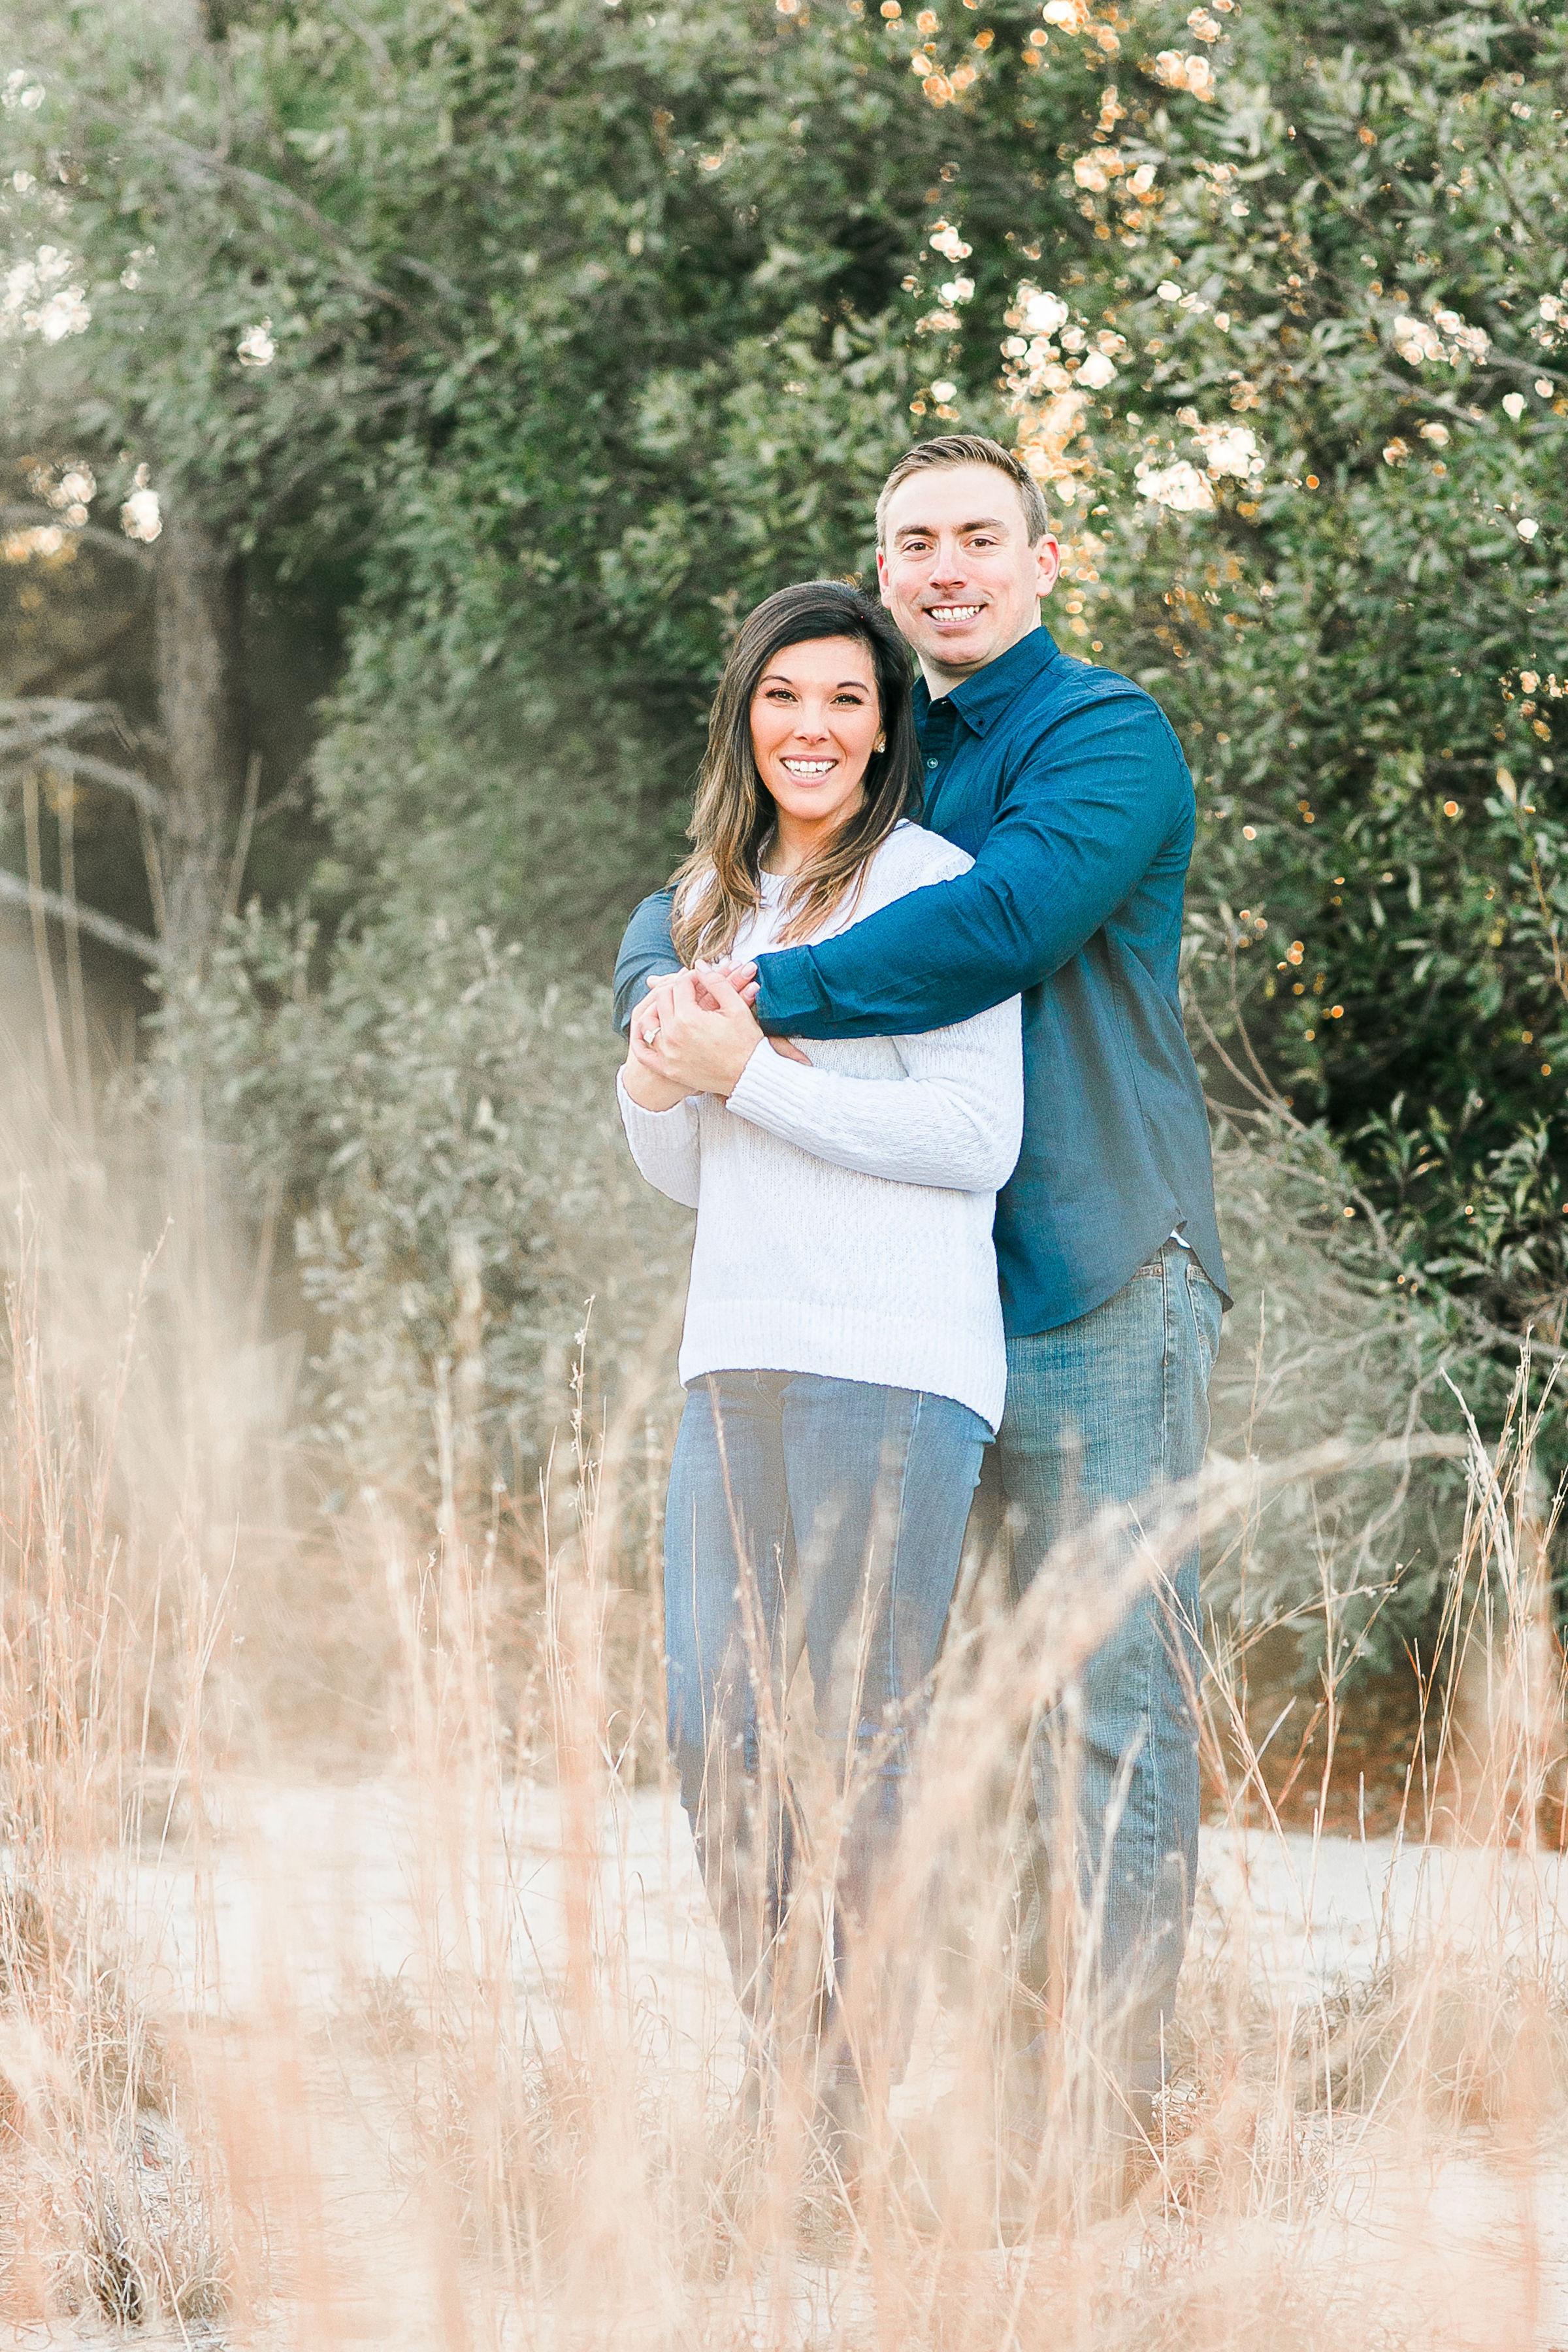 Nicole&Dustin_Engaged-106.jpg